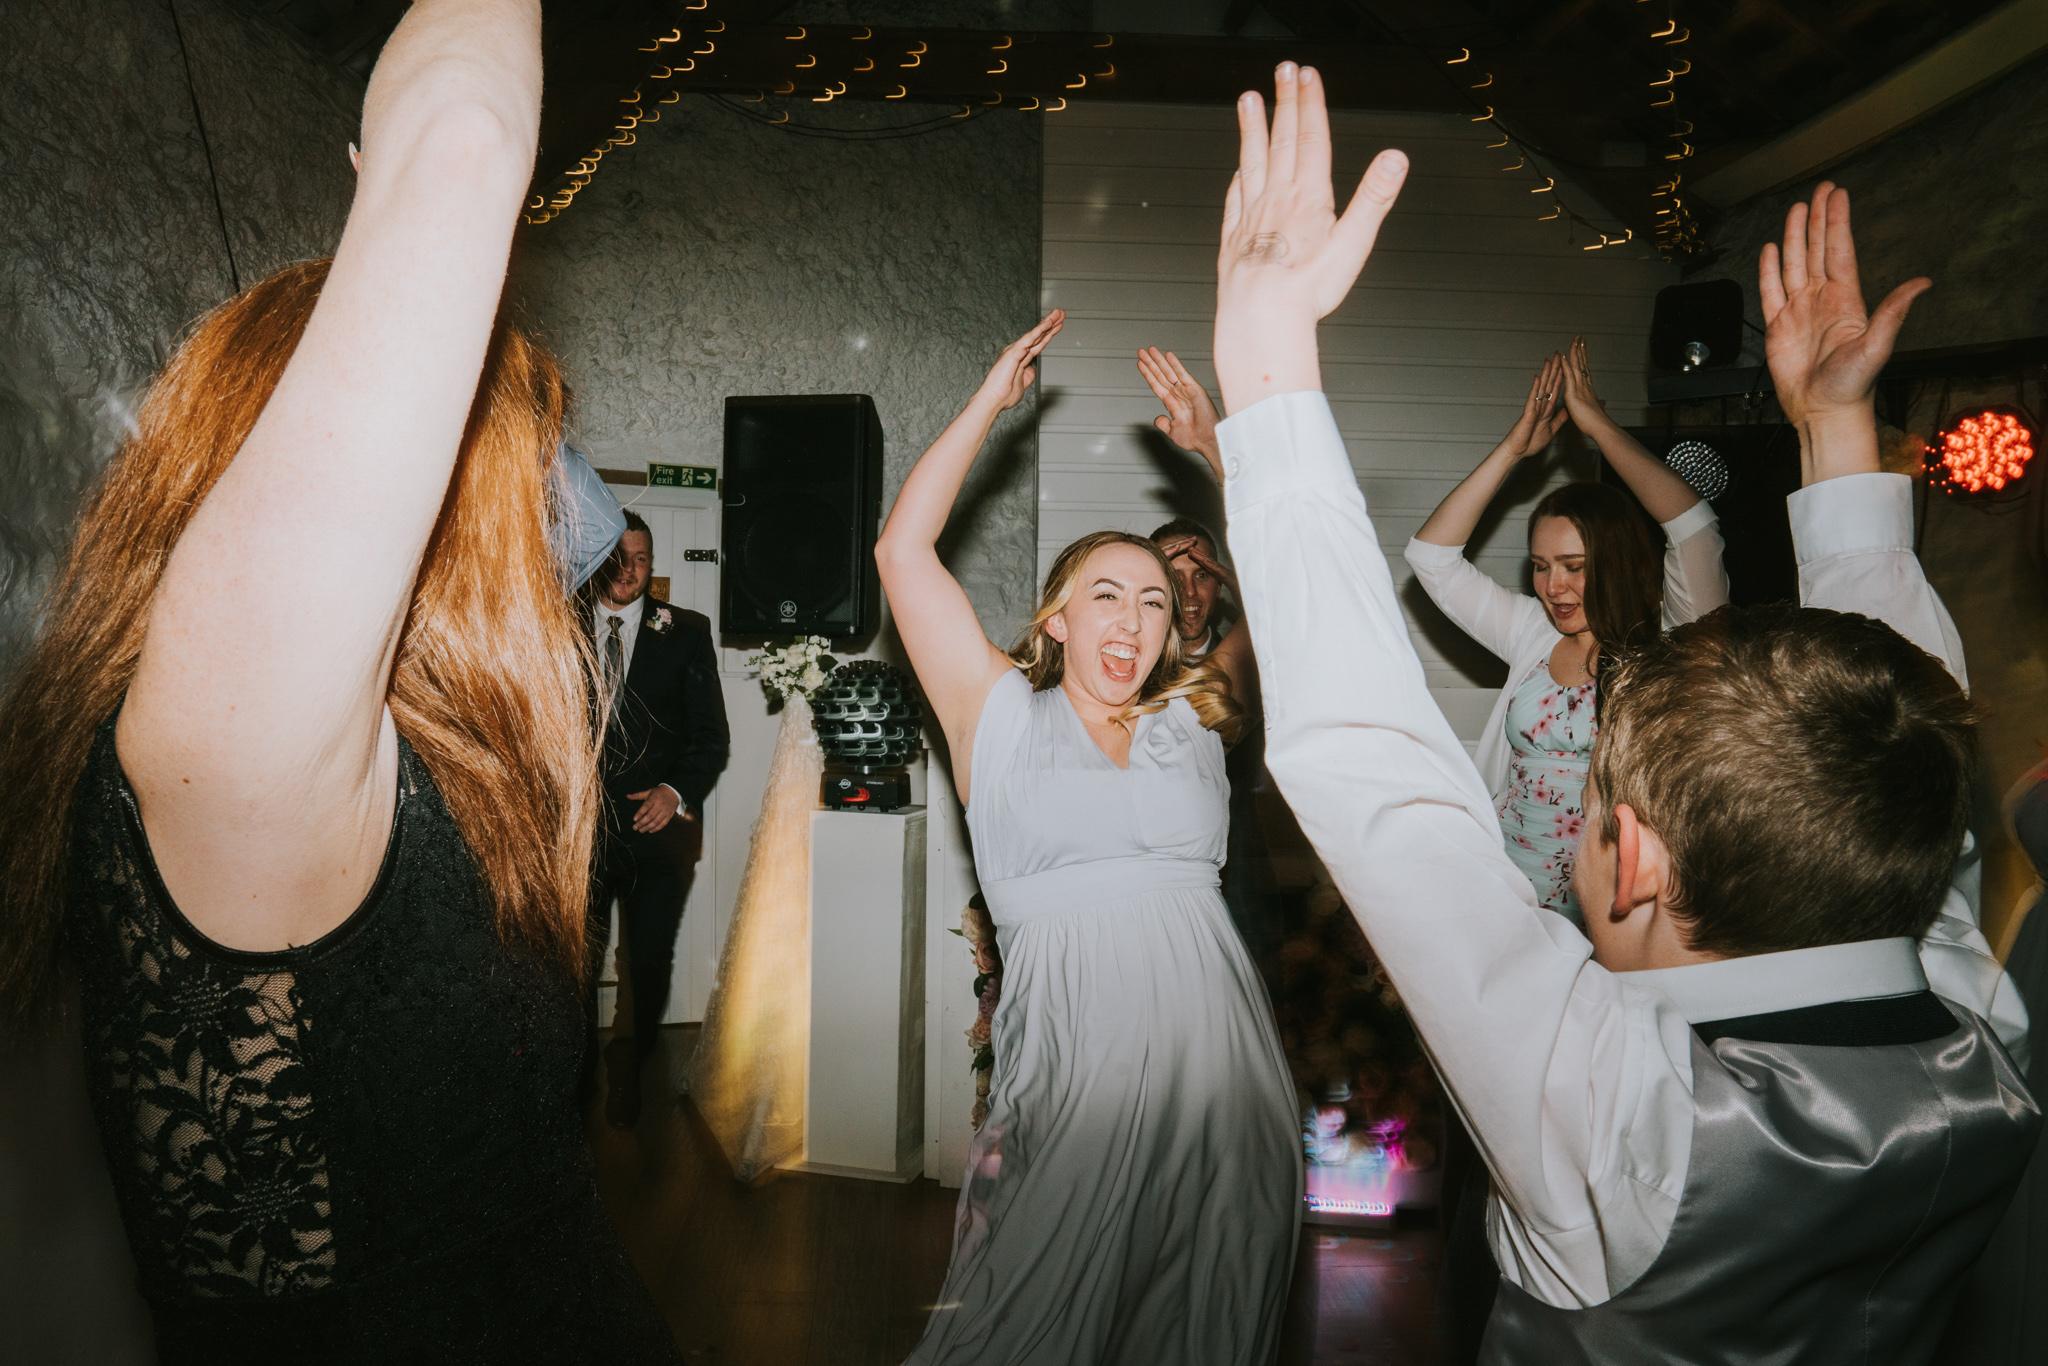 grace-sam-old-barn-clovelly-devon-wedding-photographer-grace-elizabeth-essex-suffolk-norfolk-wedding-photographer (130 of 132).jpg